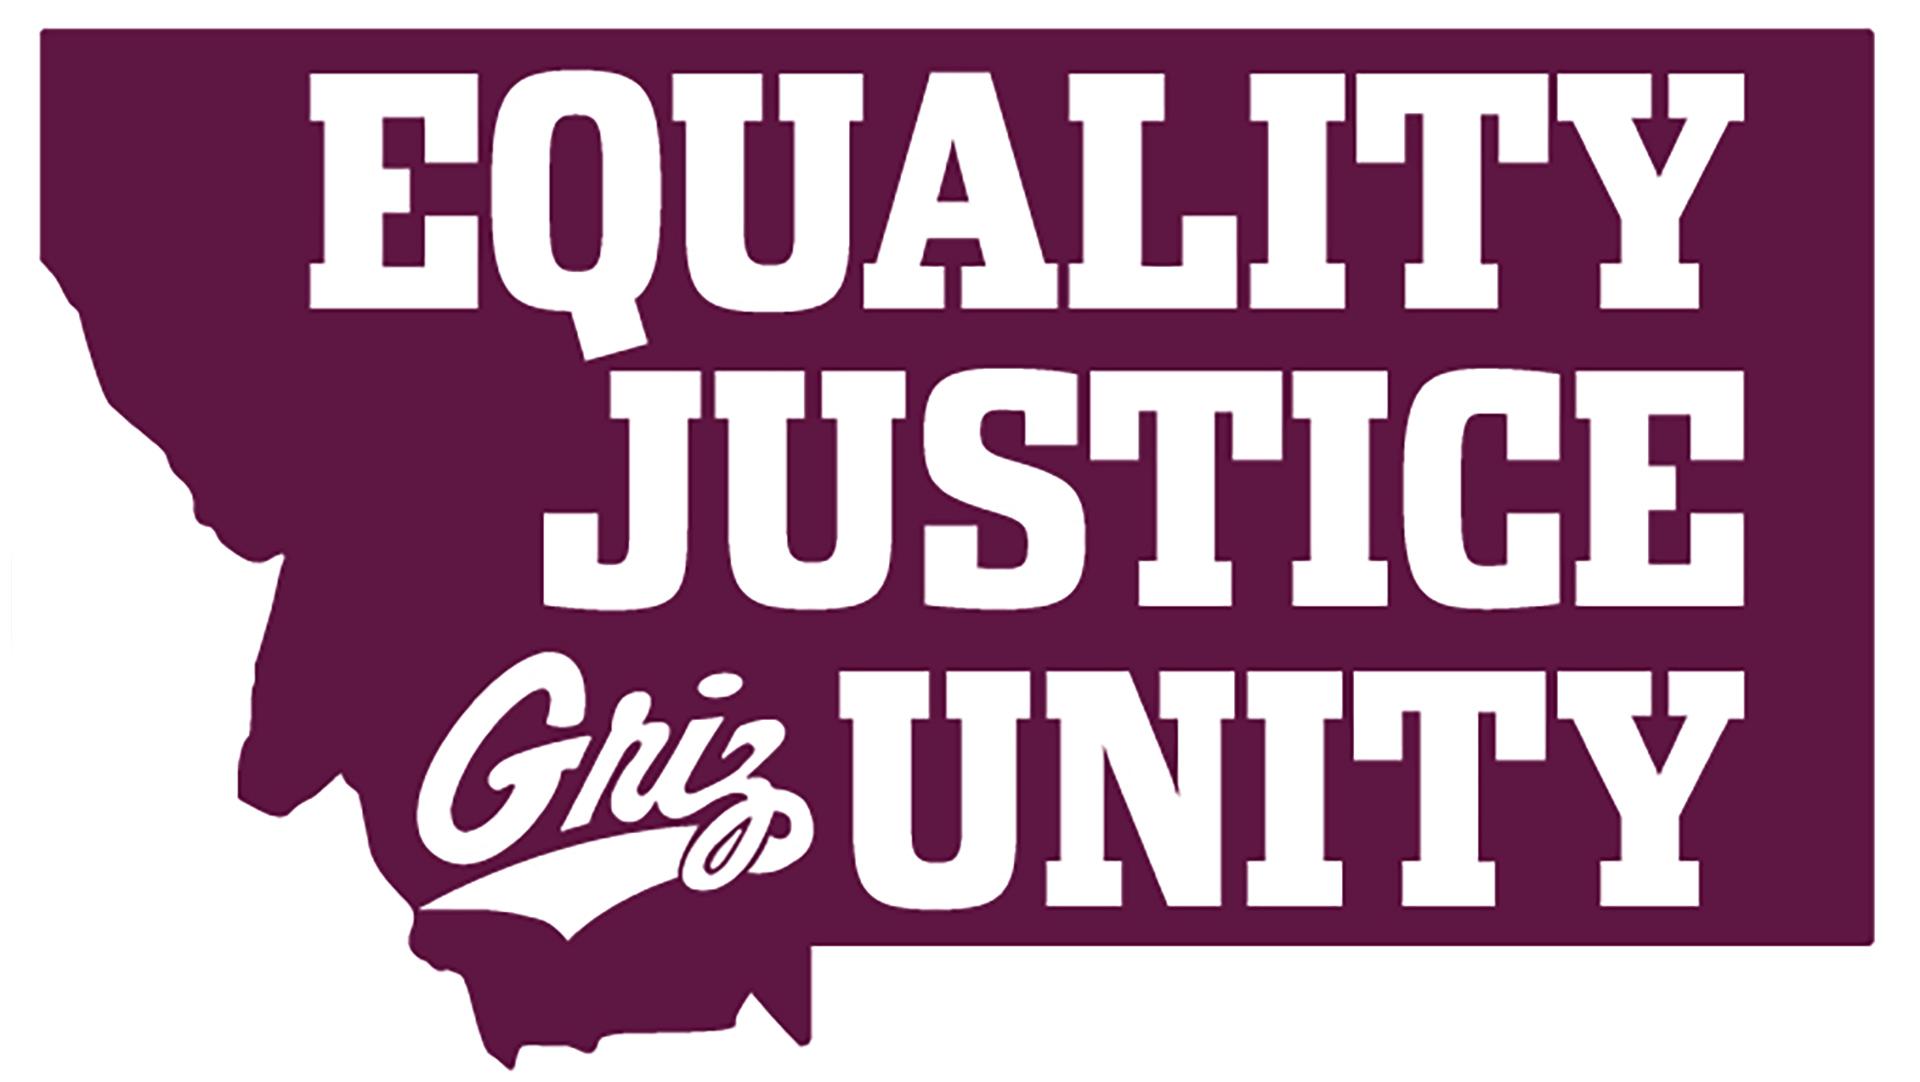 university of montana social justice patch